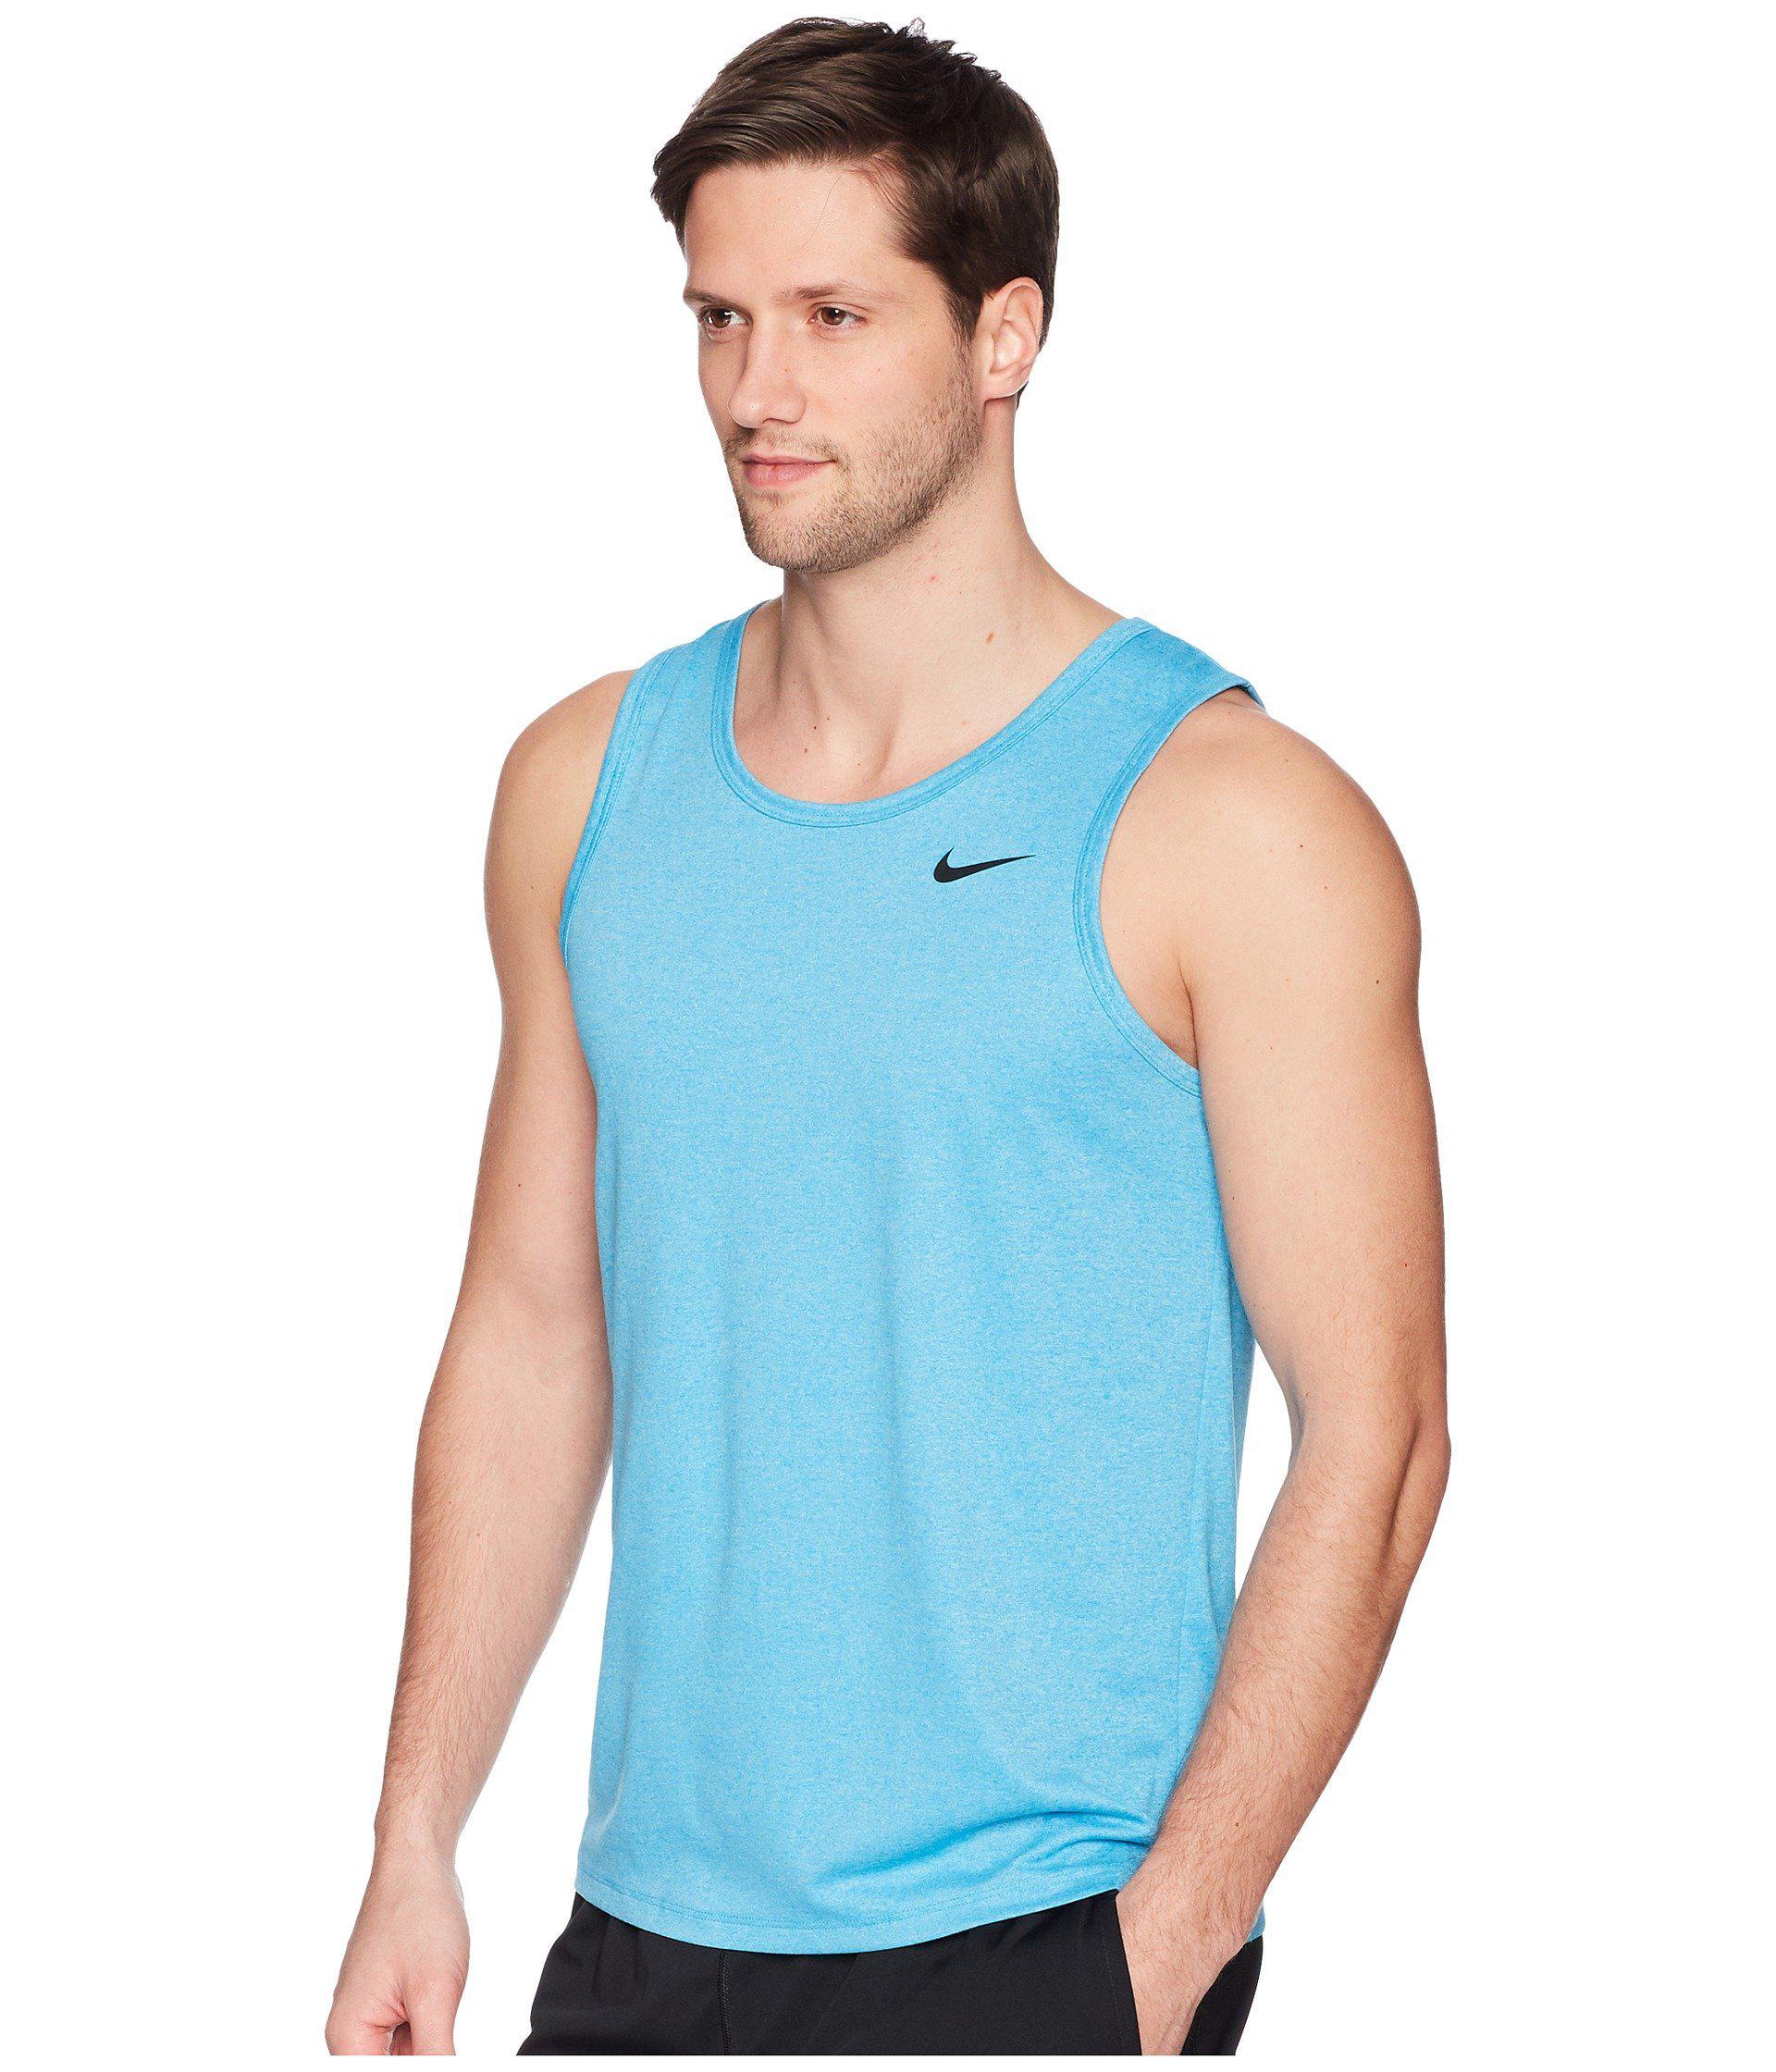 d056ece66743b Lyst - Nike Legend Tank Top (white black) Men s Sleeveless in Blue ...